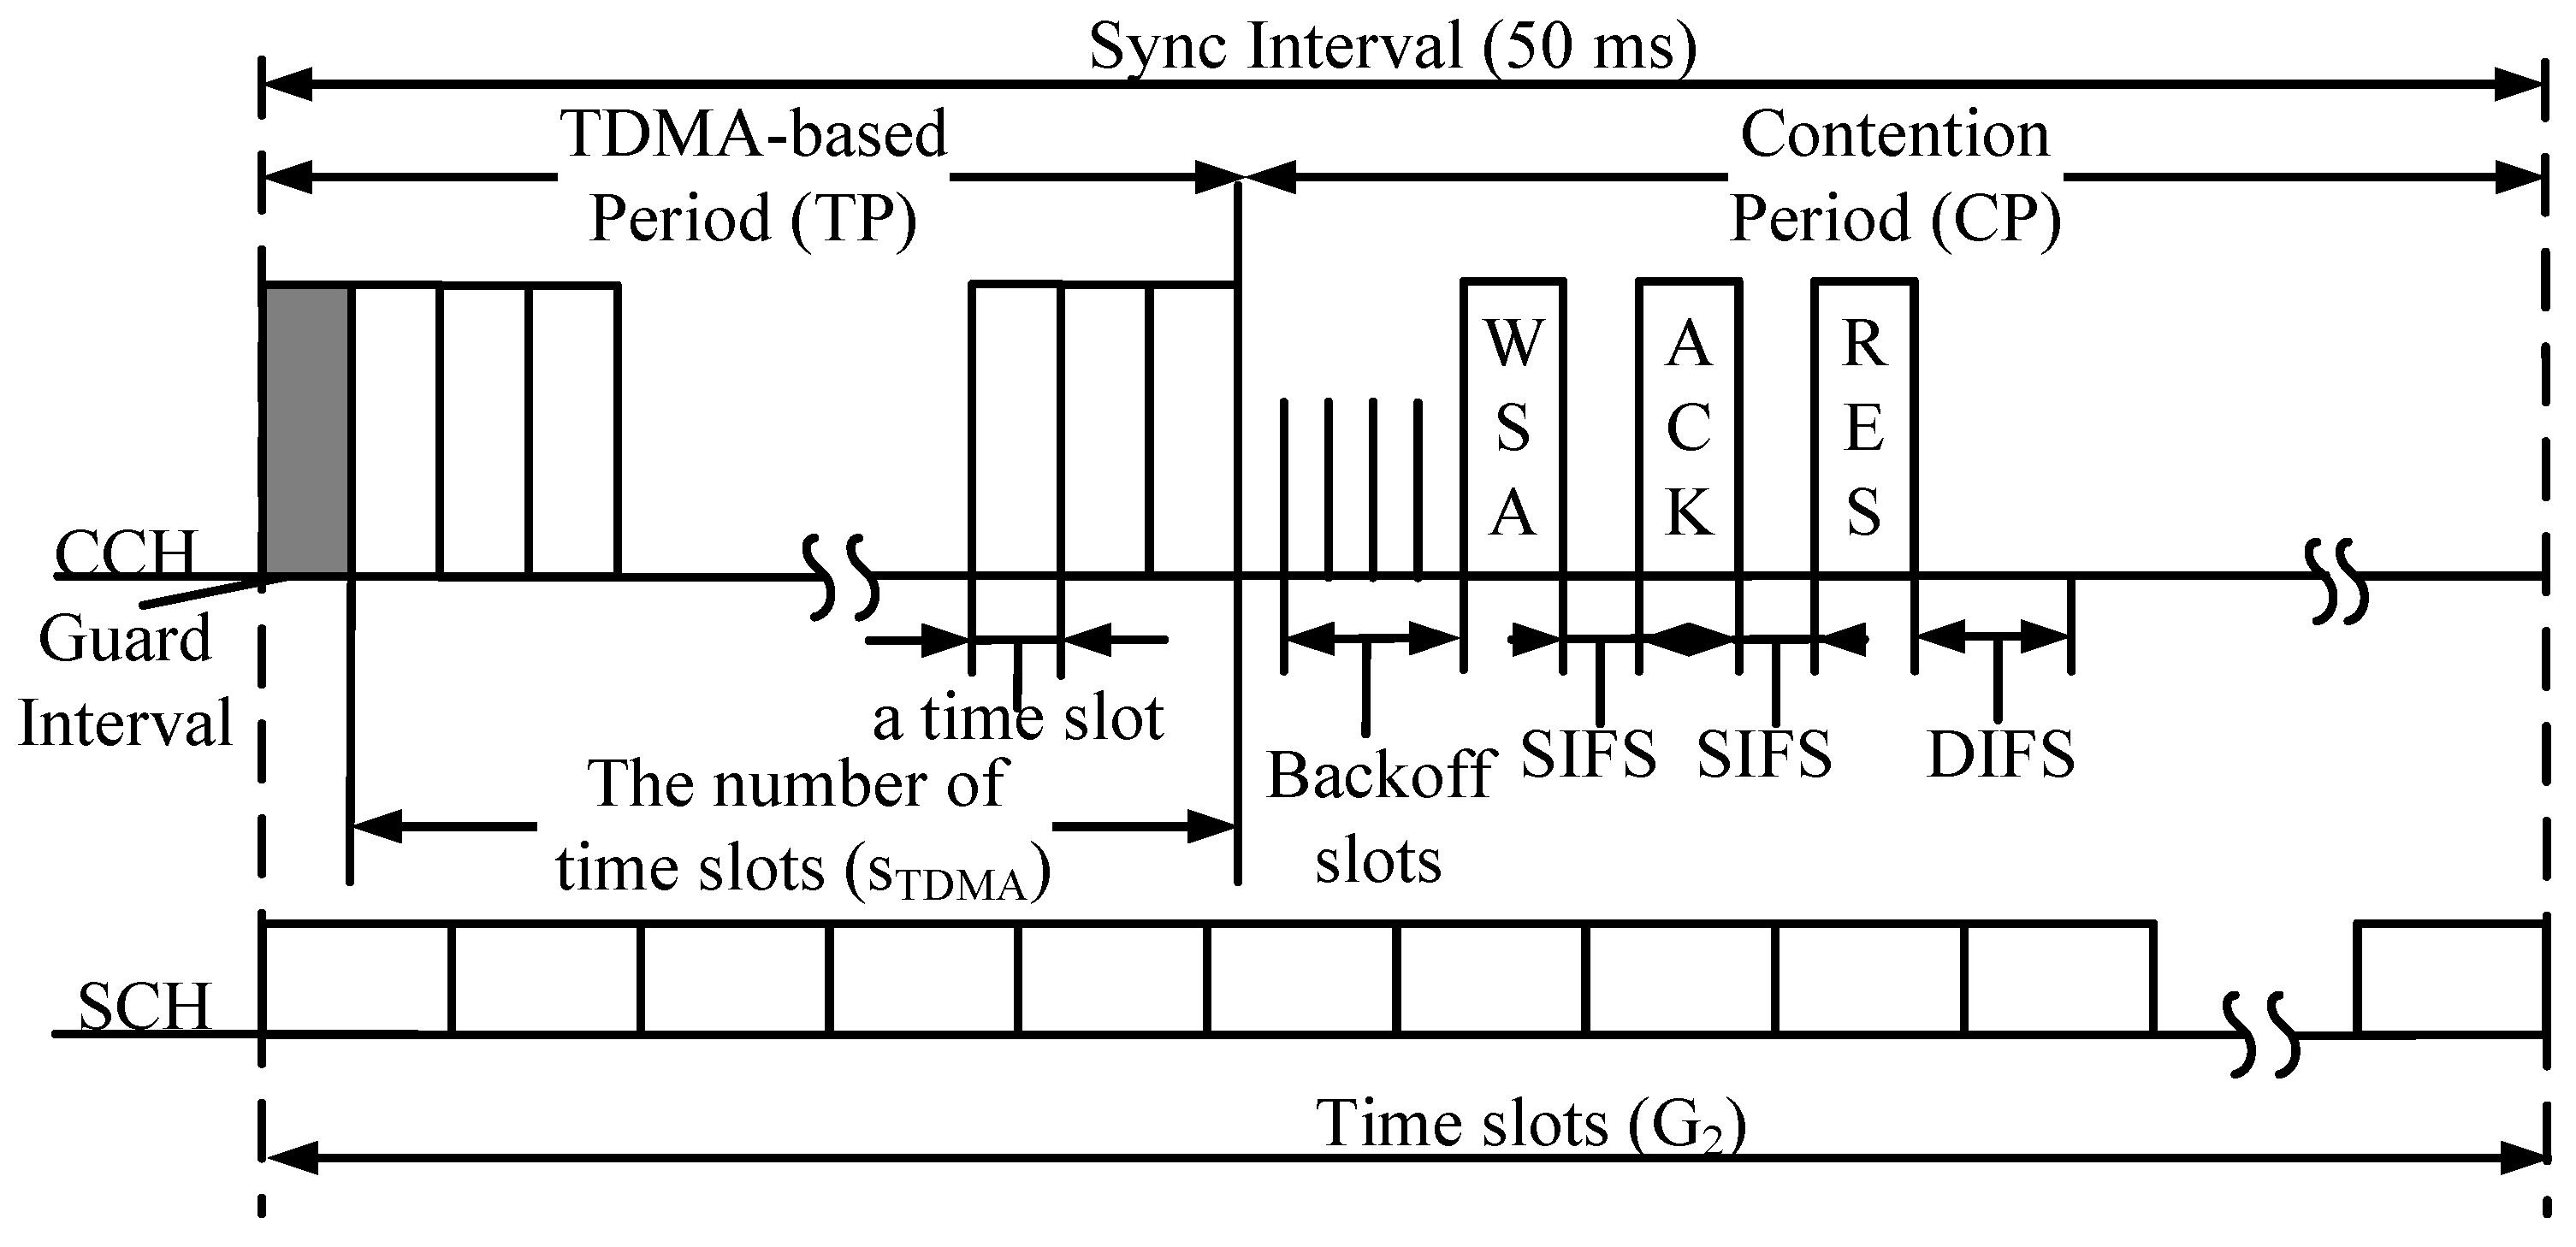 Sensors | Free Full-Text | Time Slot Utilization for